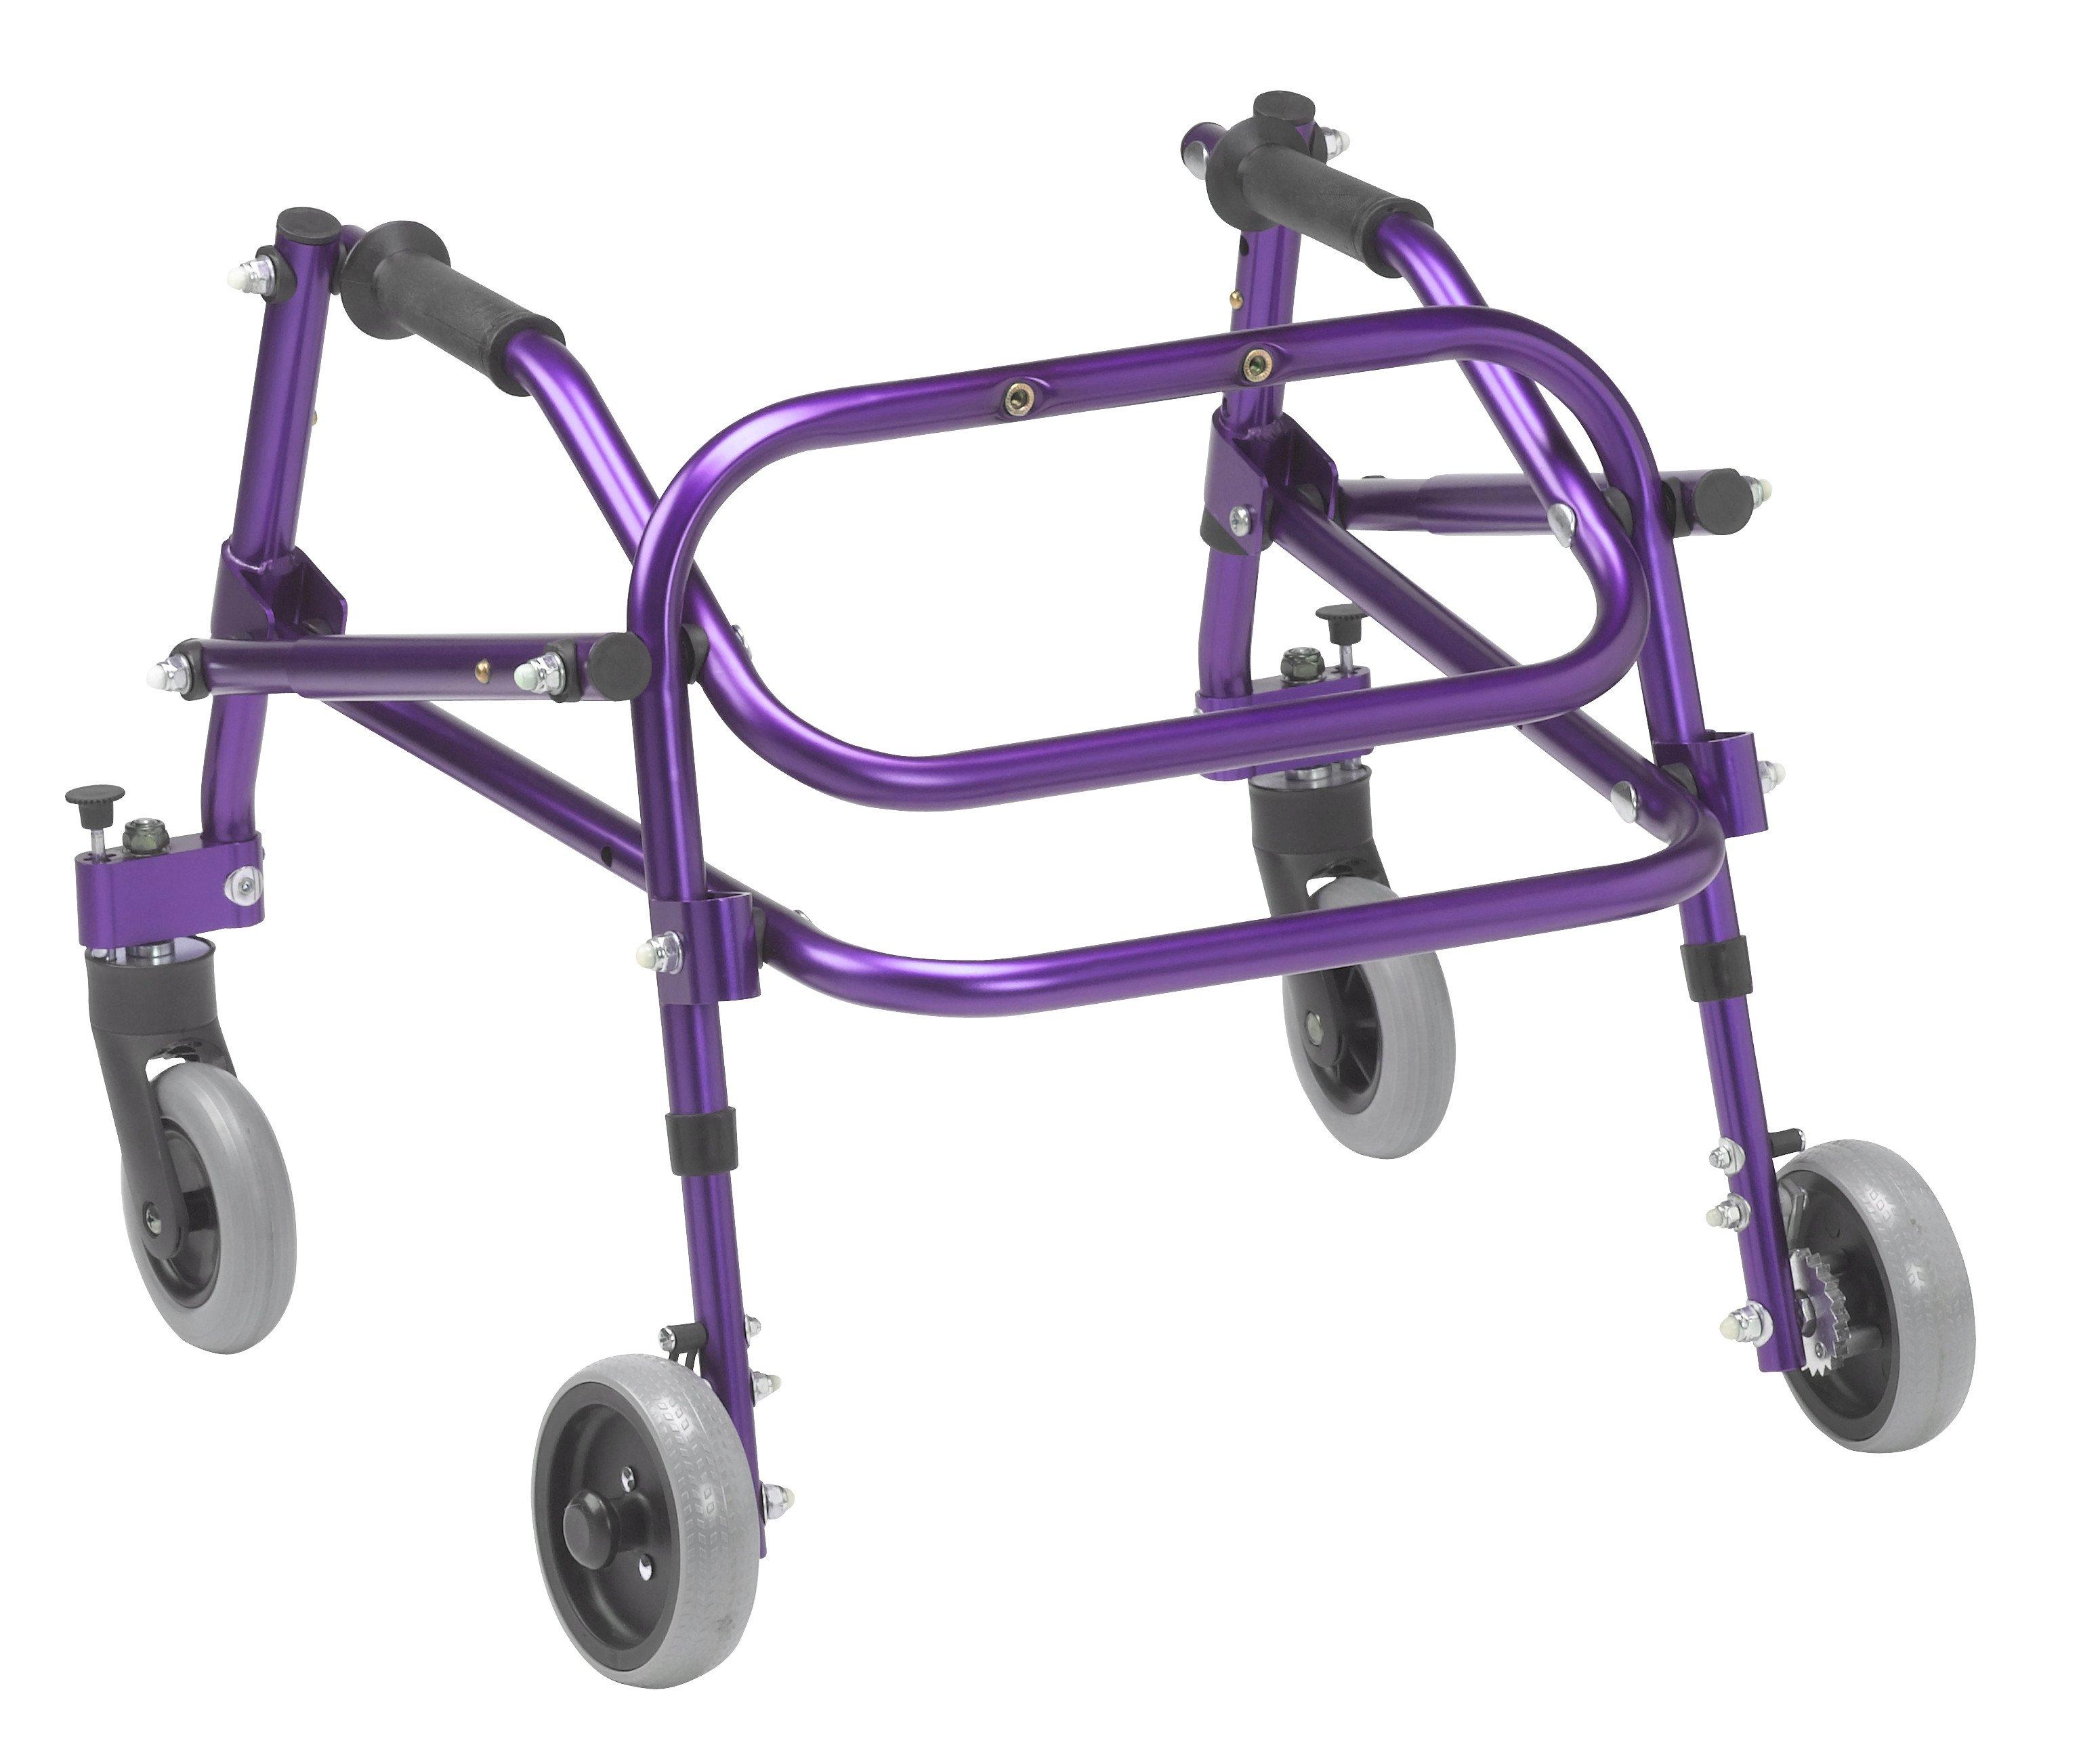 Nimbo 2G Lightweight Posterior Walker - Extra Small - Wizard Purple - Angle View